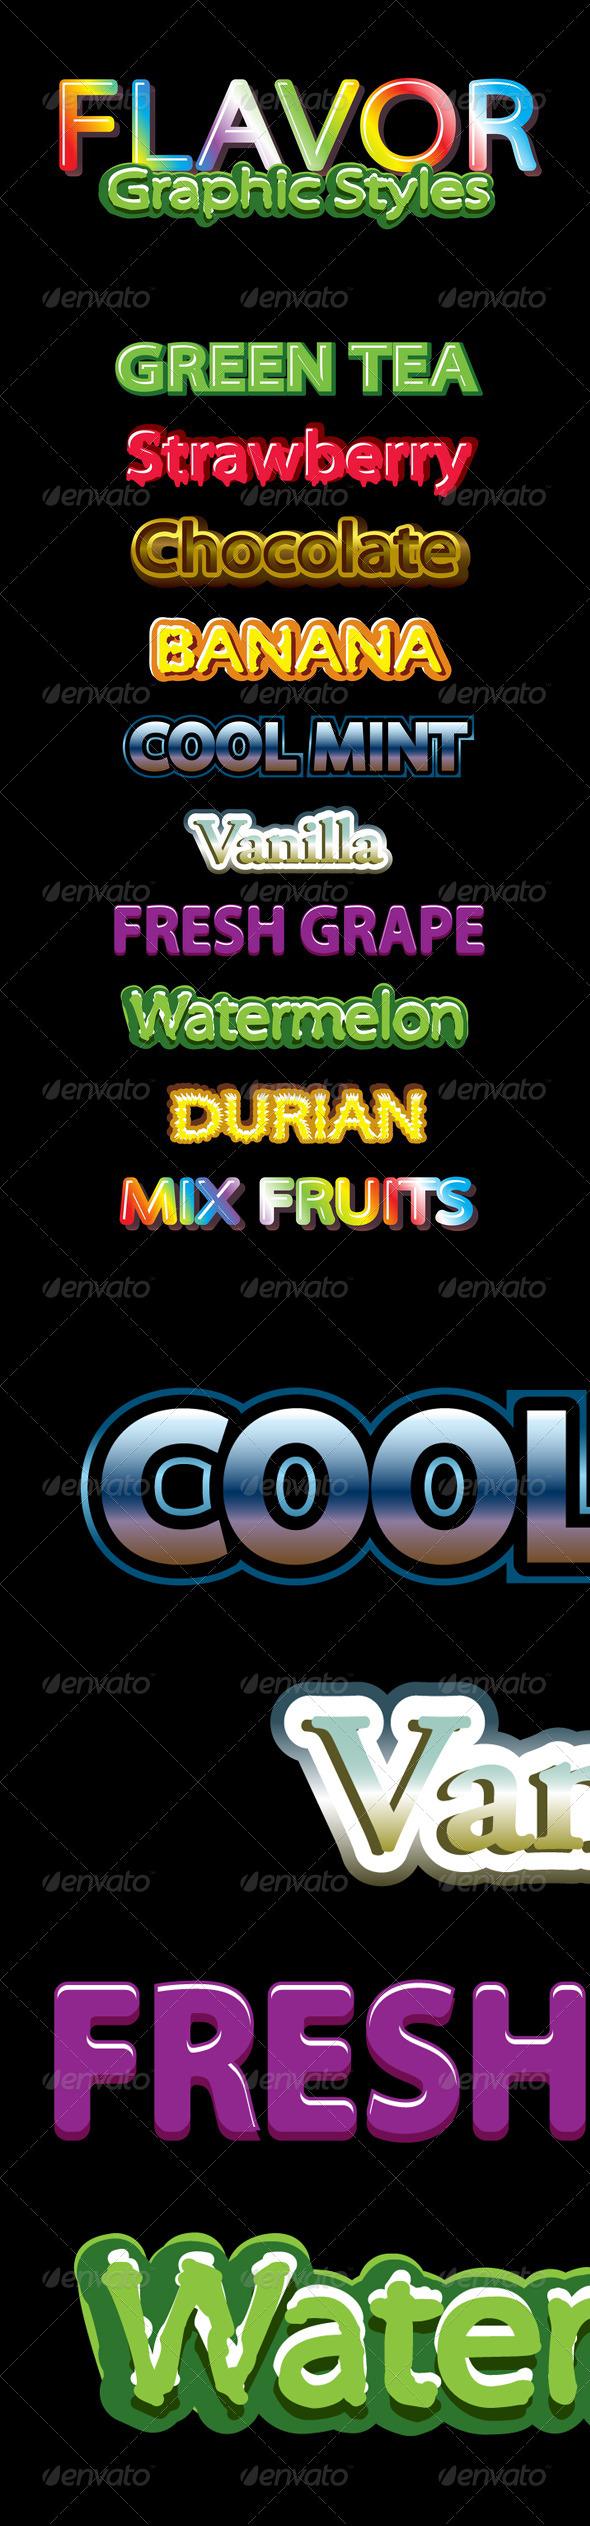 GraphicRiver Flavor Graphic Styles 8664708